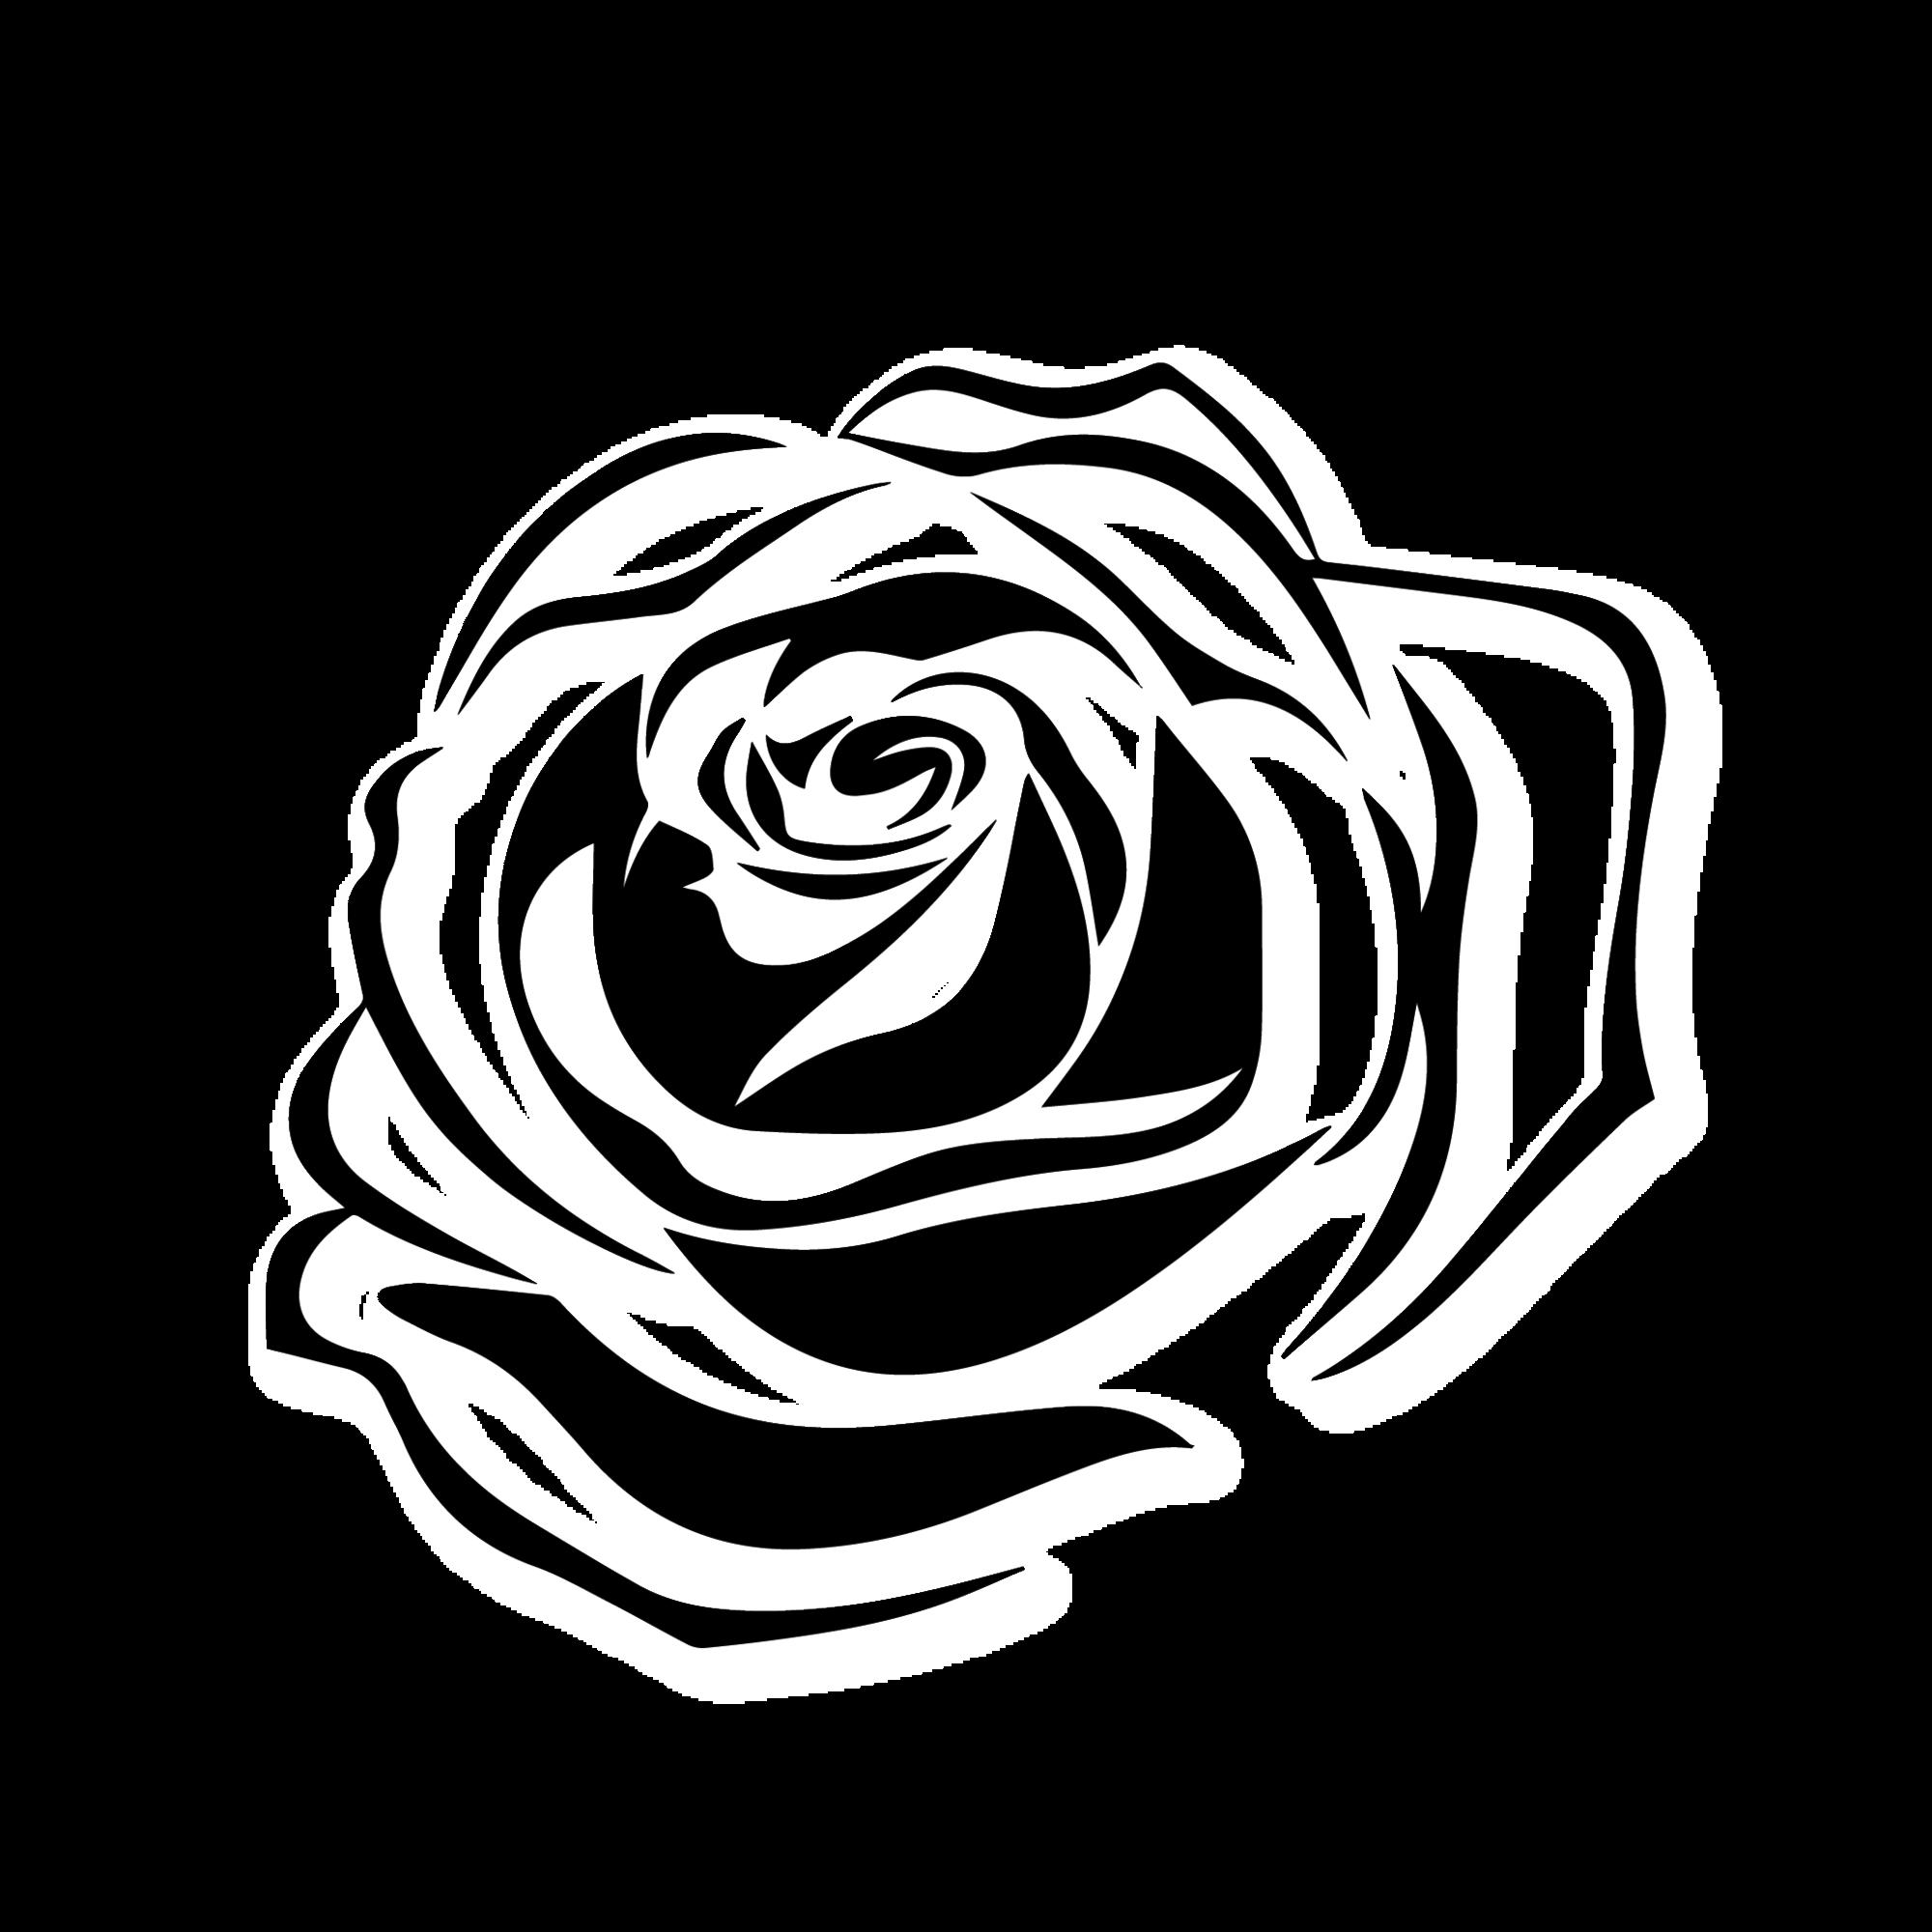 Art - rose tattoo png download - 2000*2000 - Free Transparent Art png Download. - Clip Art Library